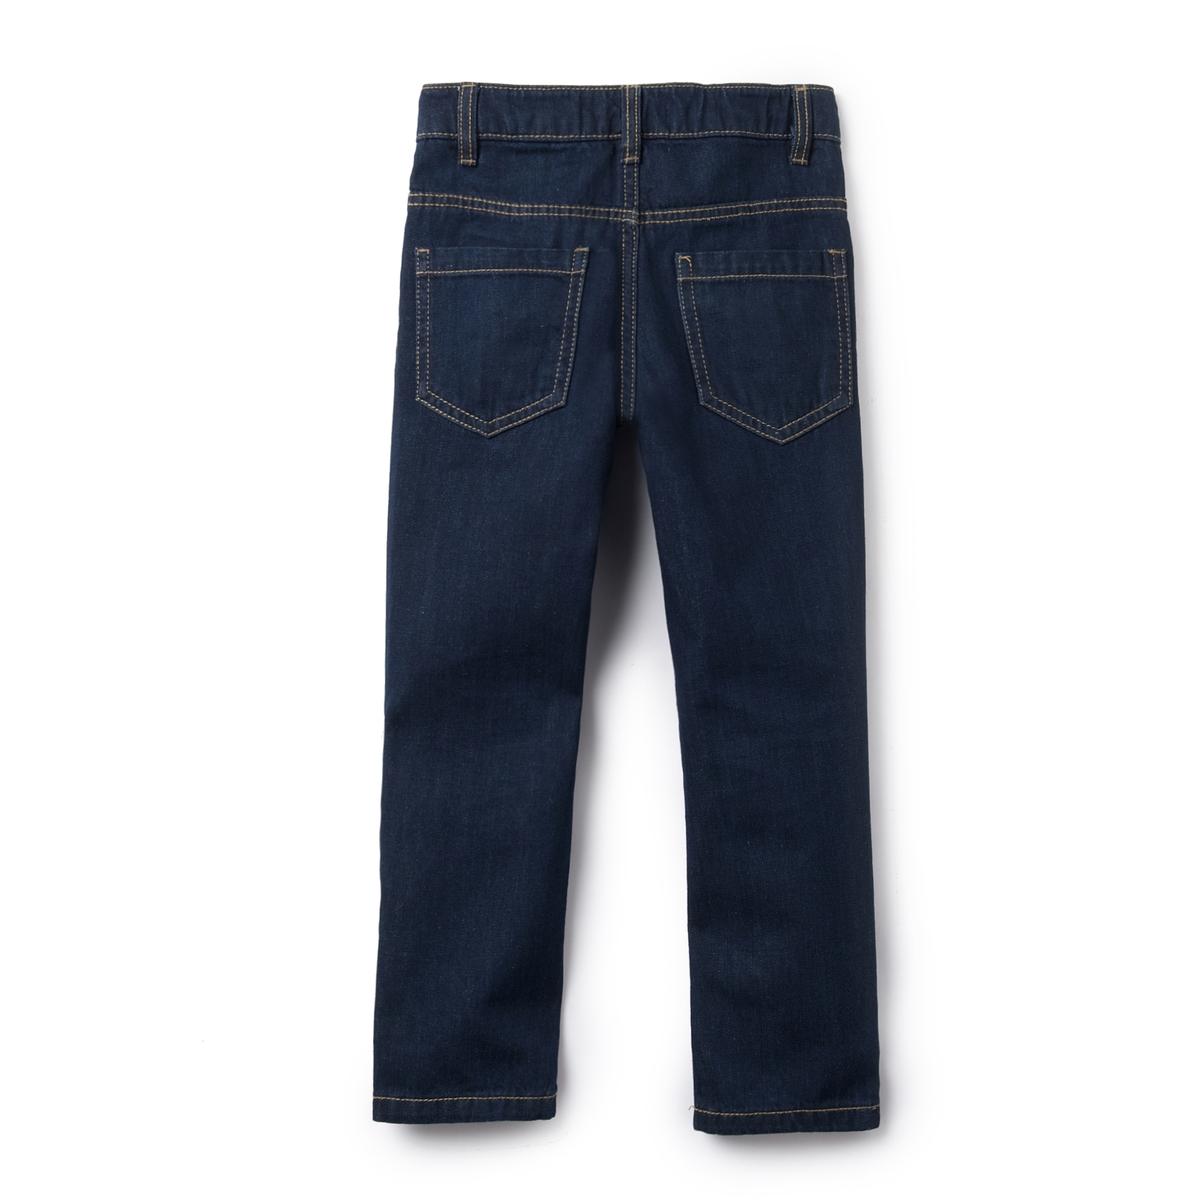 Jeans, gerade Form, 3 12 Jahre